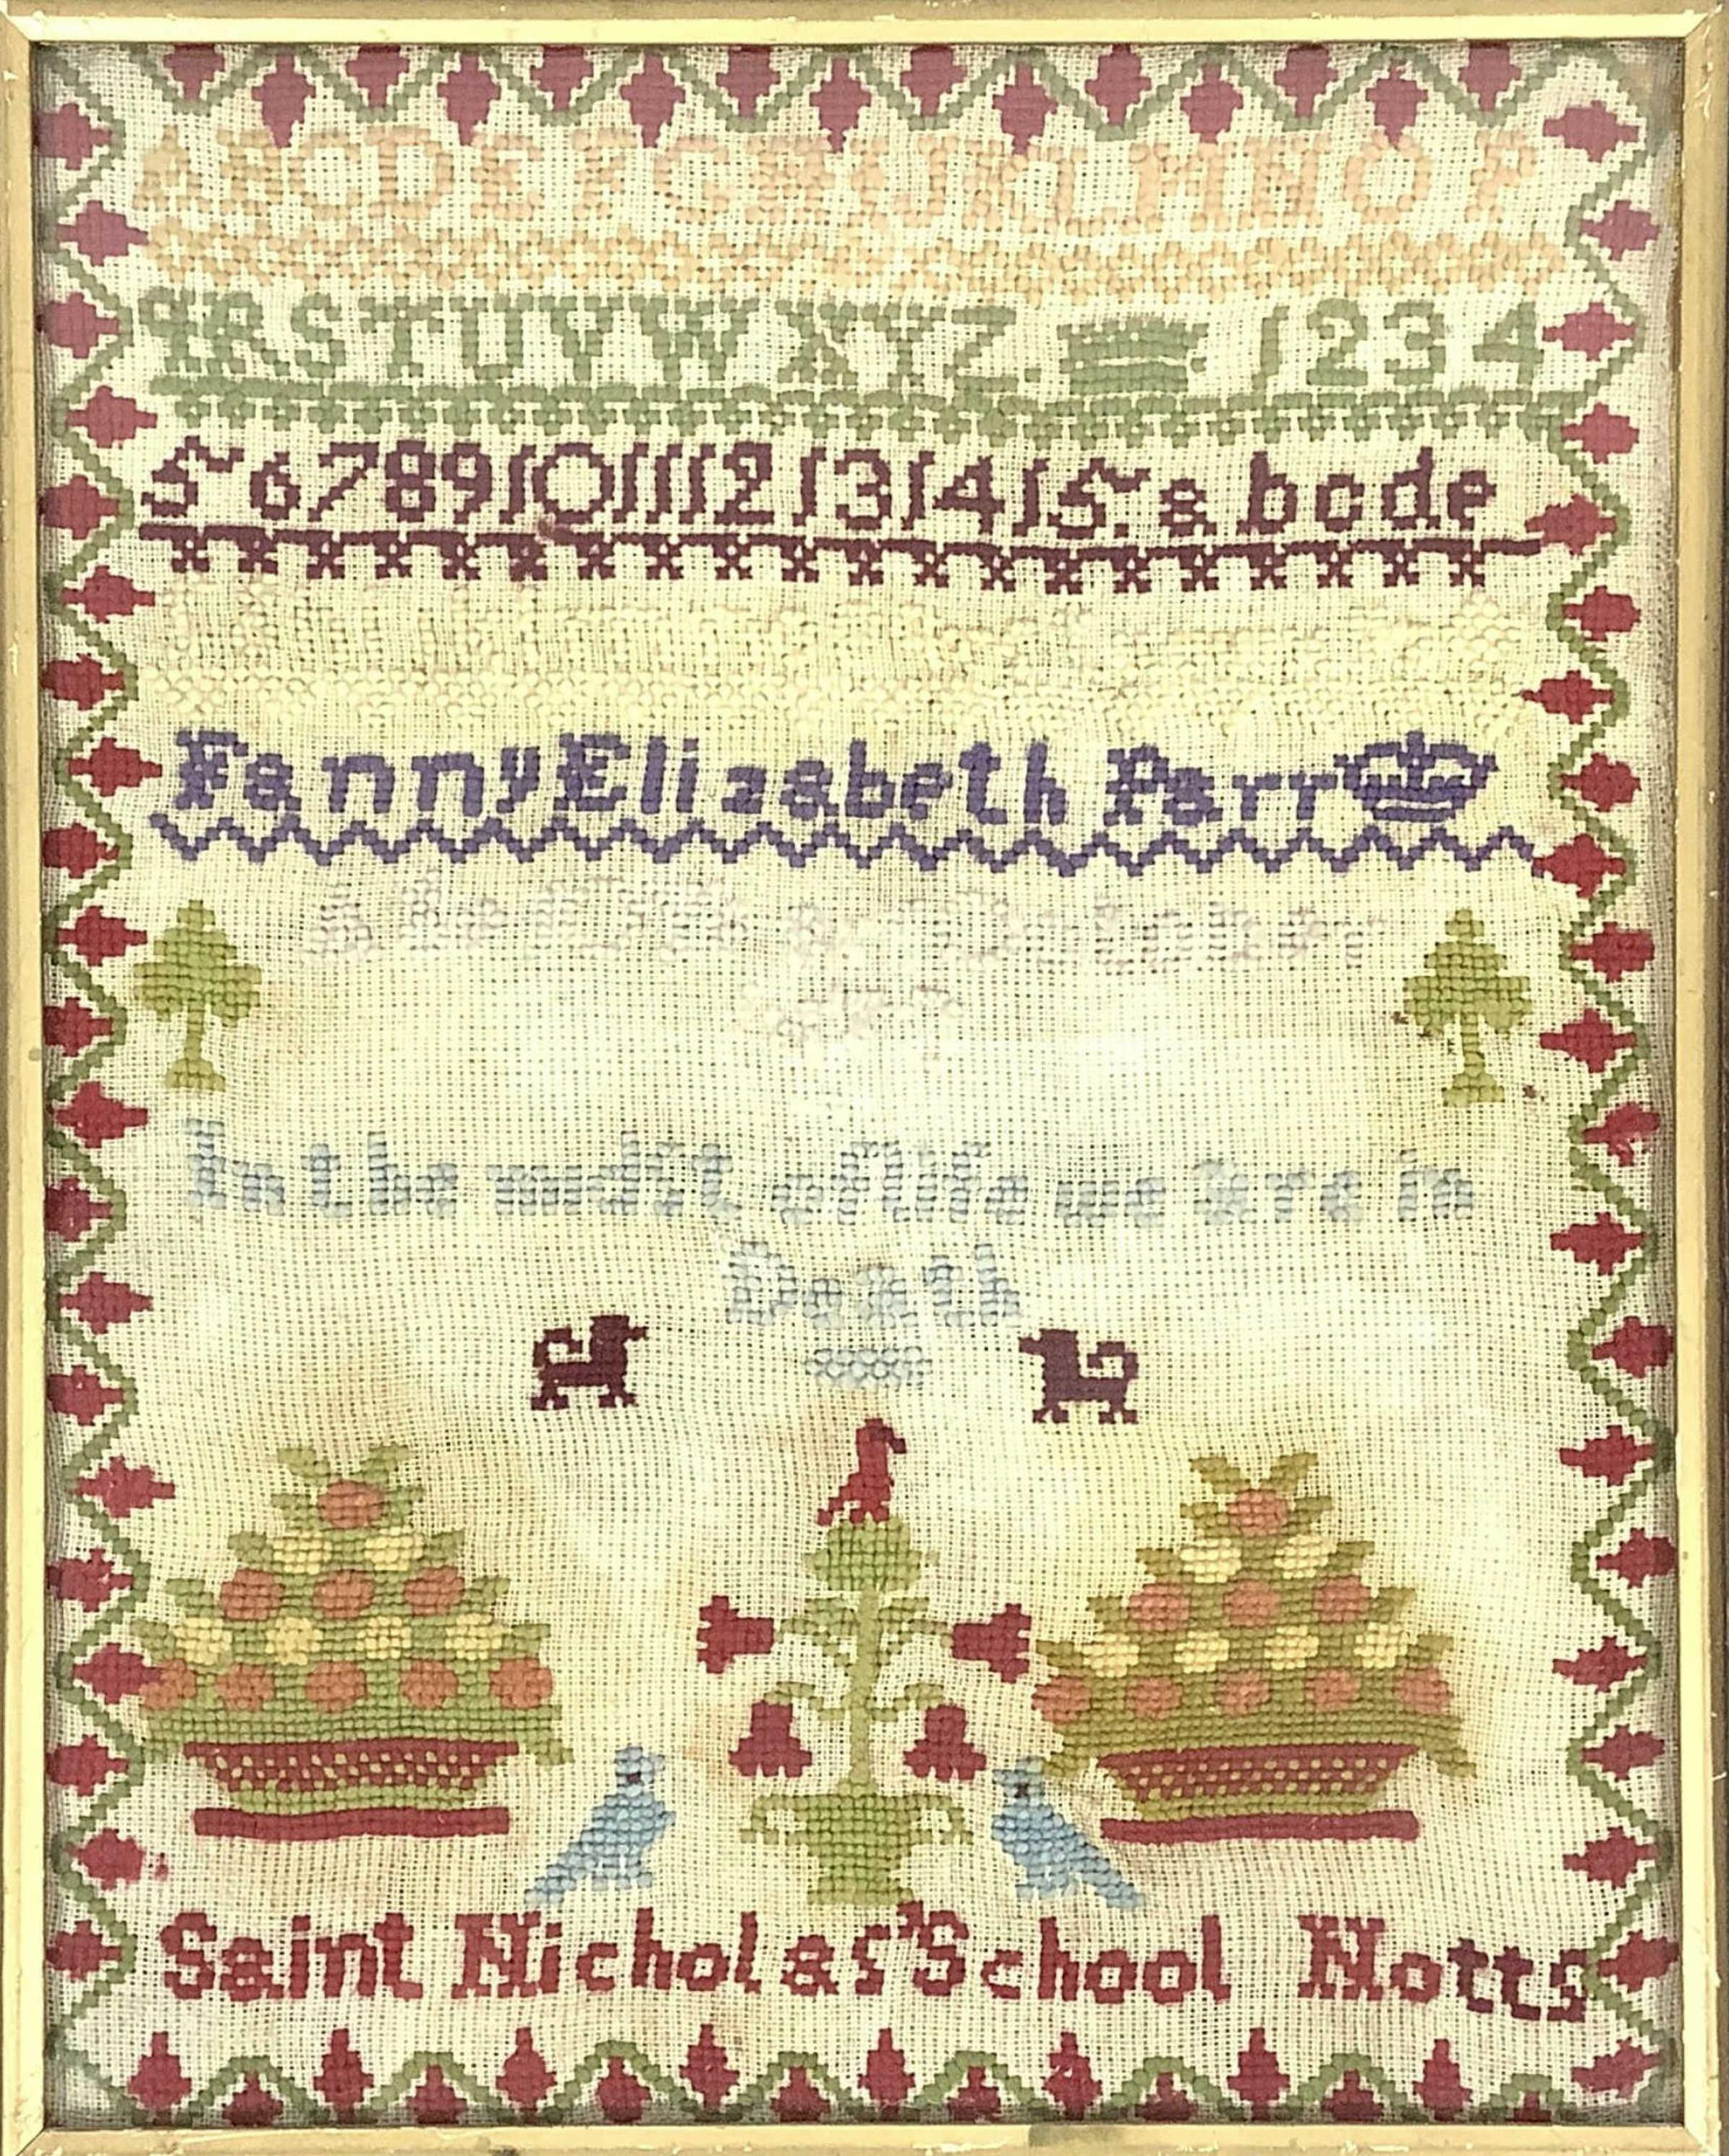 Antique Framed English Needlepoint Sampler